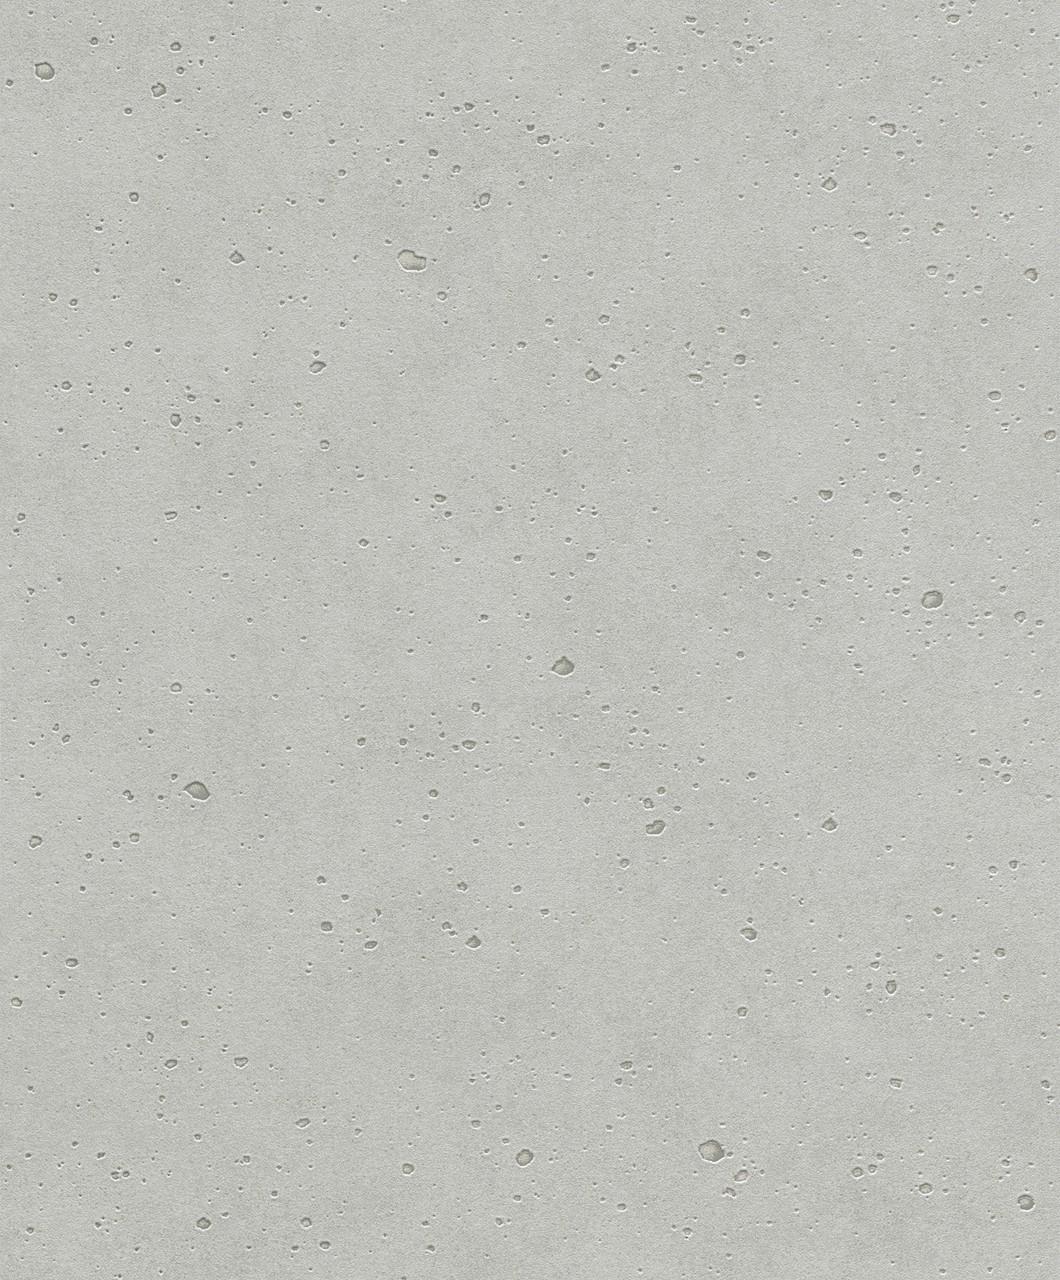 vliestapete beton beton optik stein rasch grau 475210. Black Bedroom Furniture Sets. Home Design Ideas